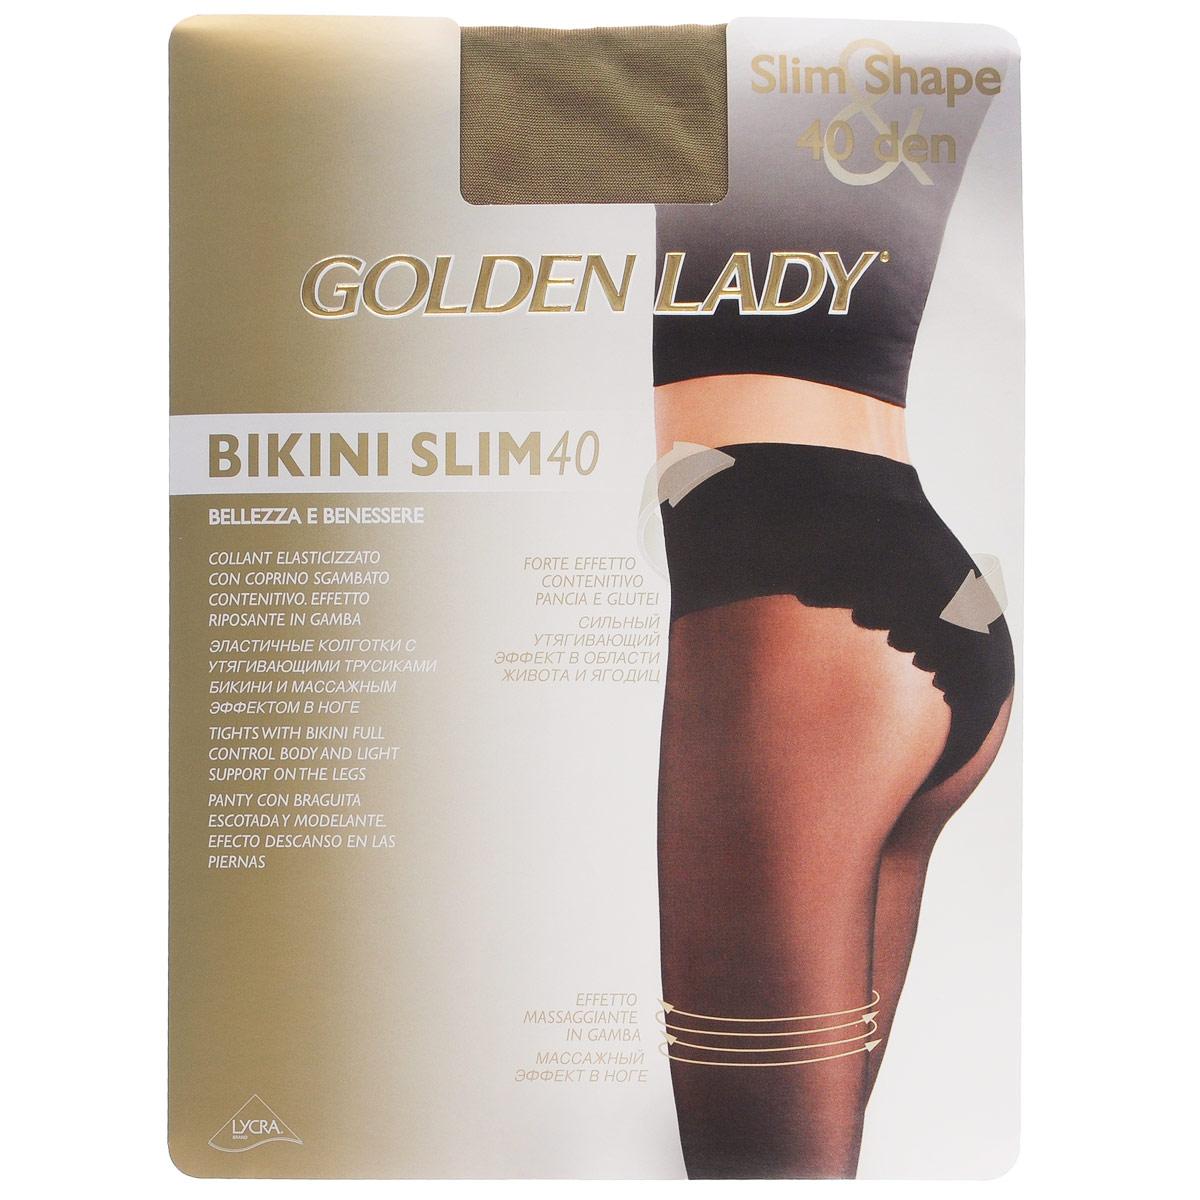 Колготки женские Golden Lady Bikini Slim 40, цвет: Melon (телесный). 122LLL. Размер 3 (M) цены онлайн